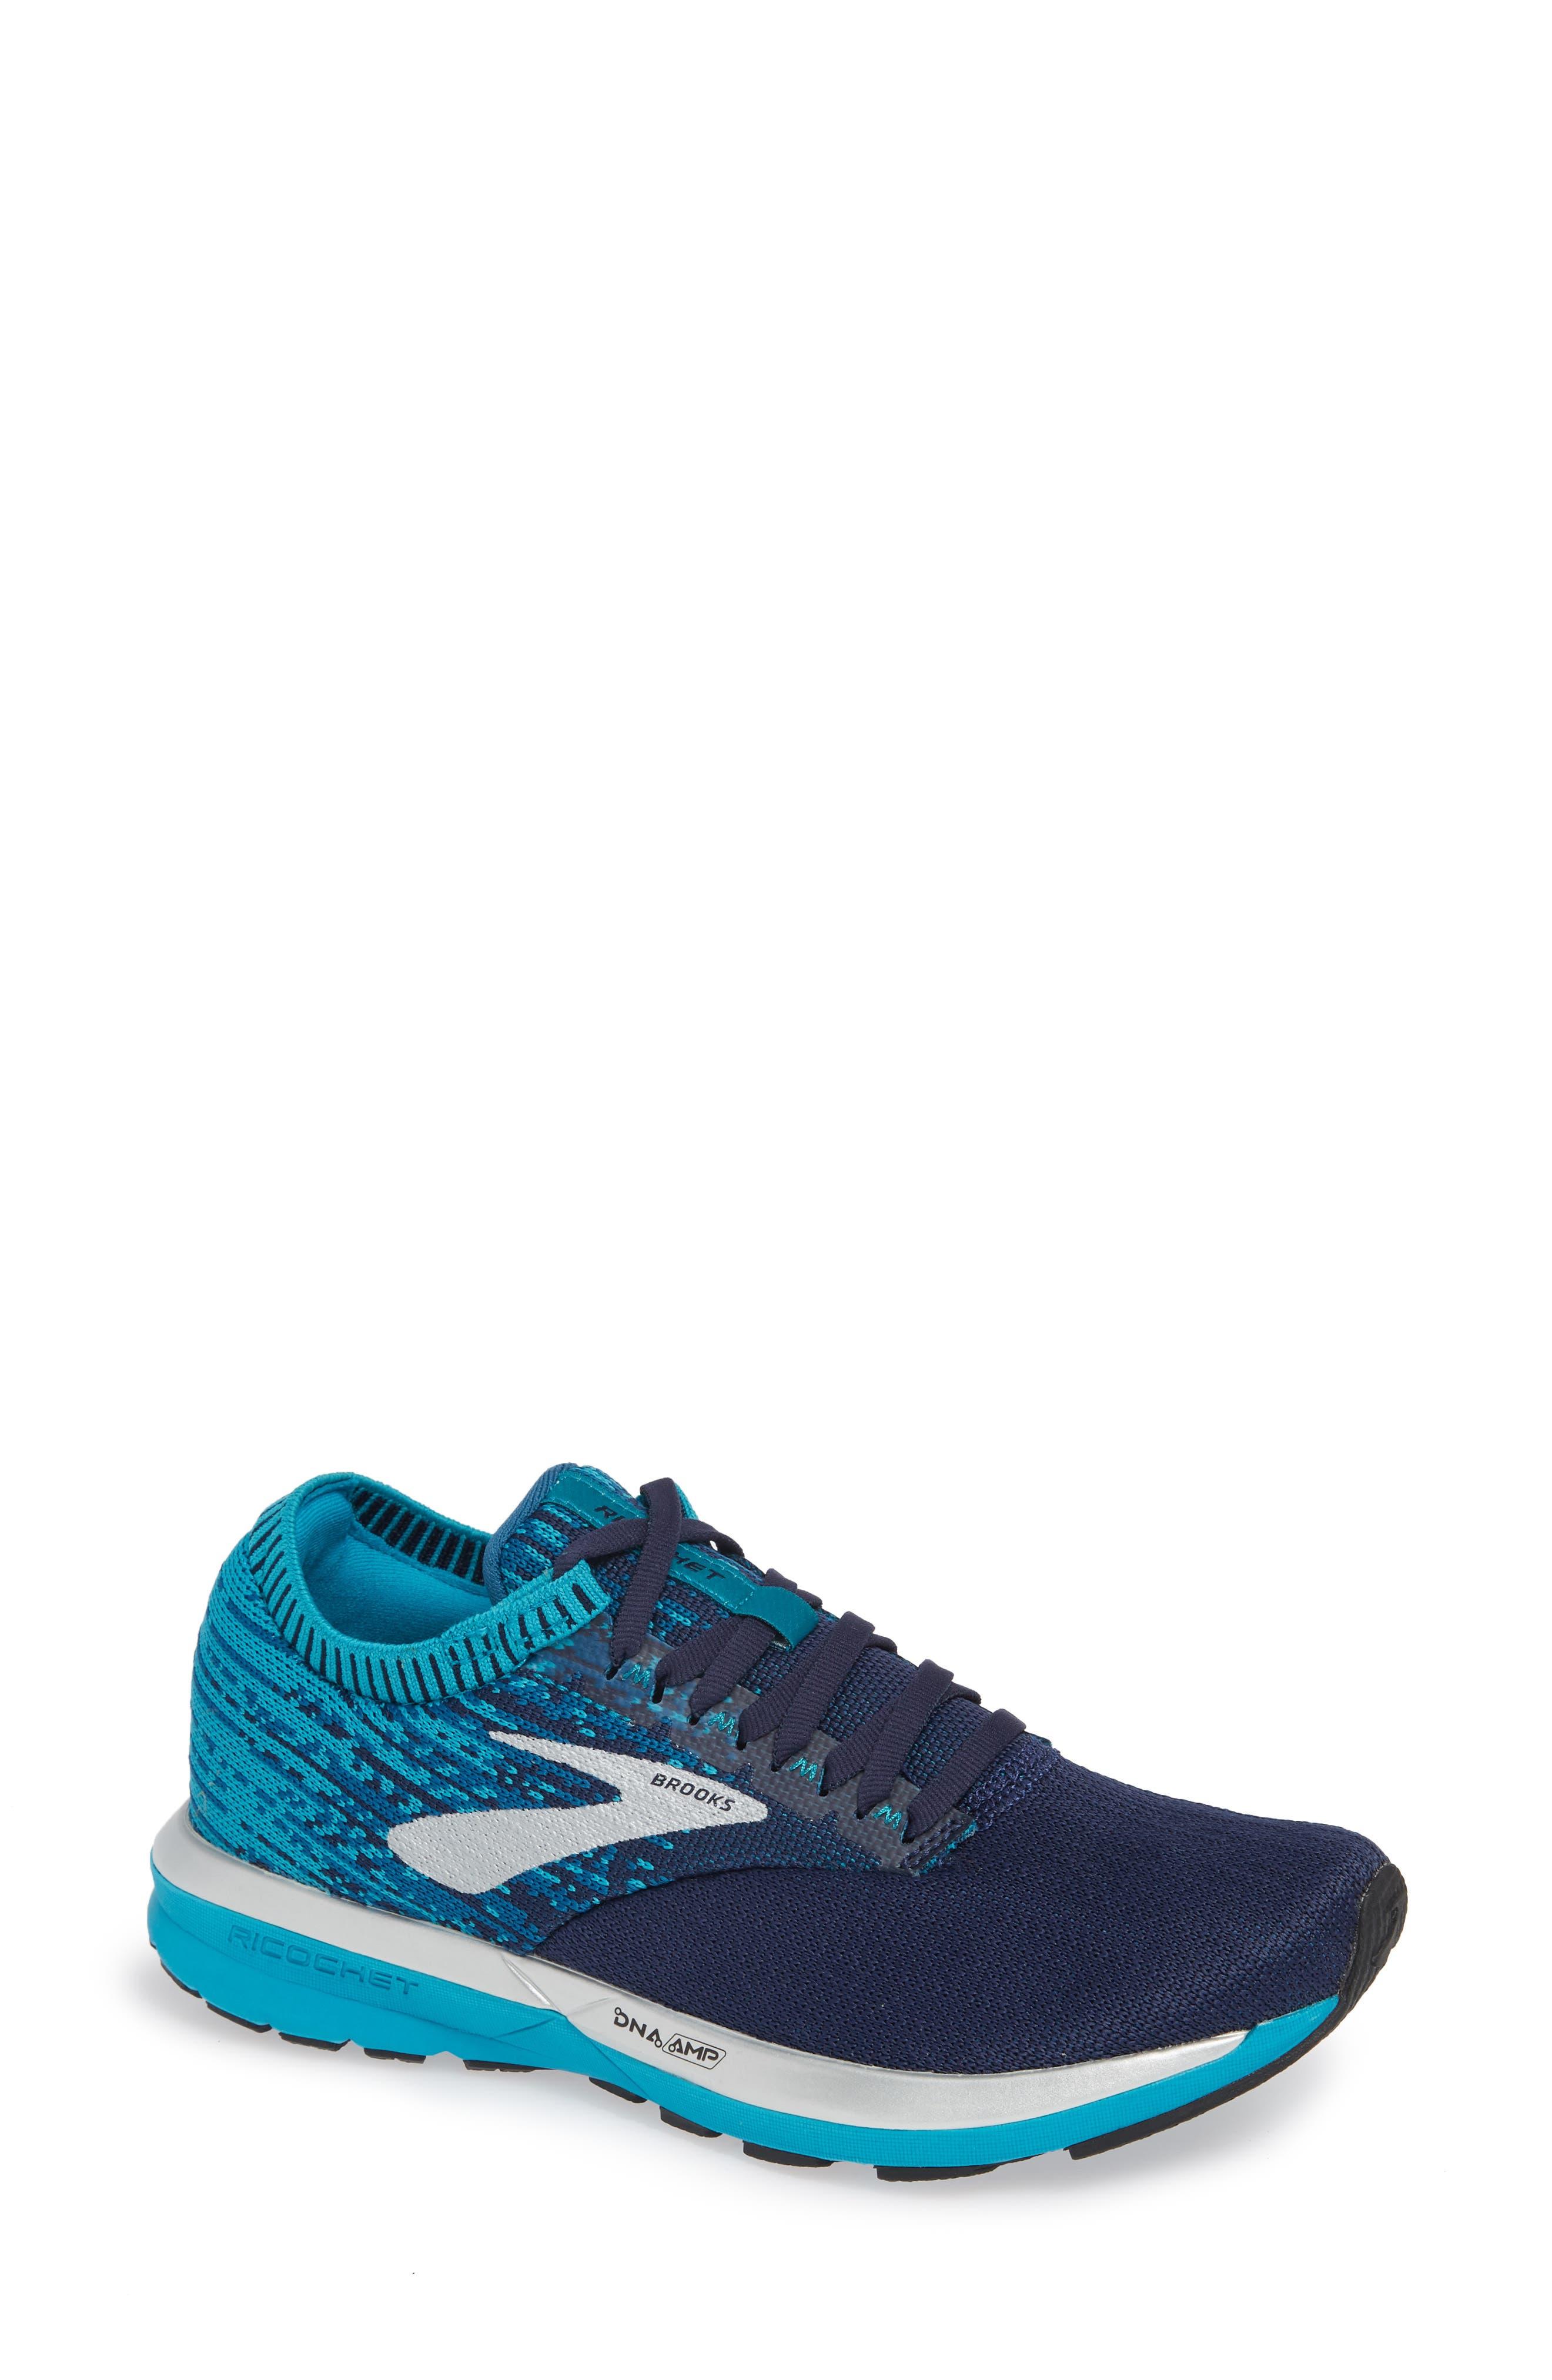 Brooks Ricochet Running Shoe B - Blue